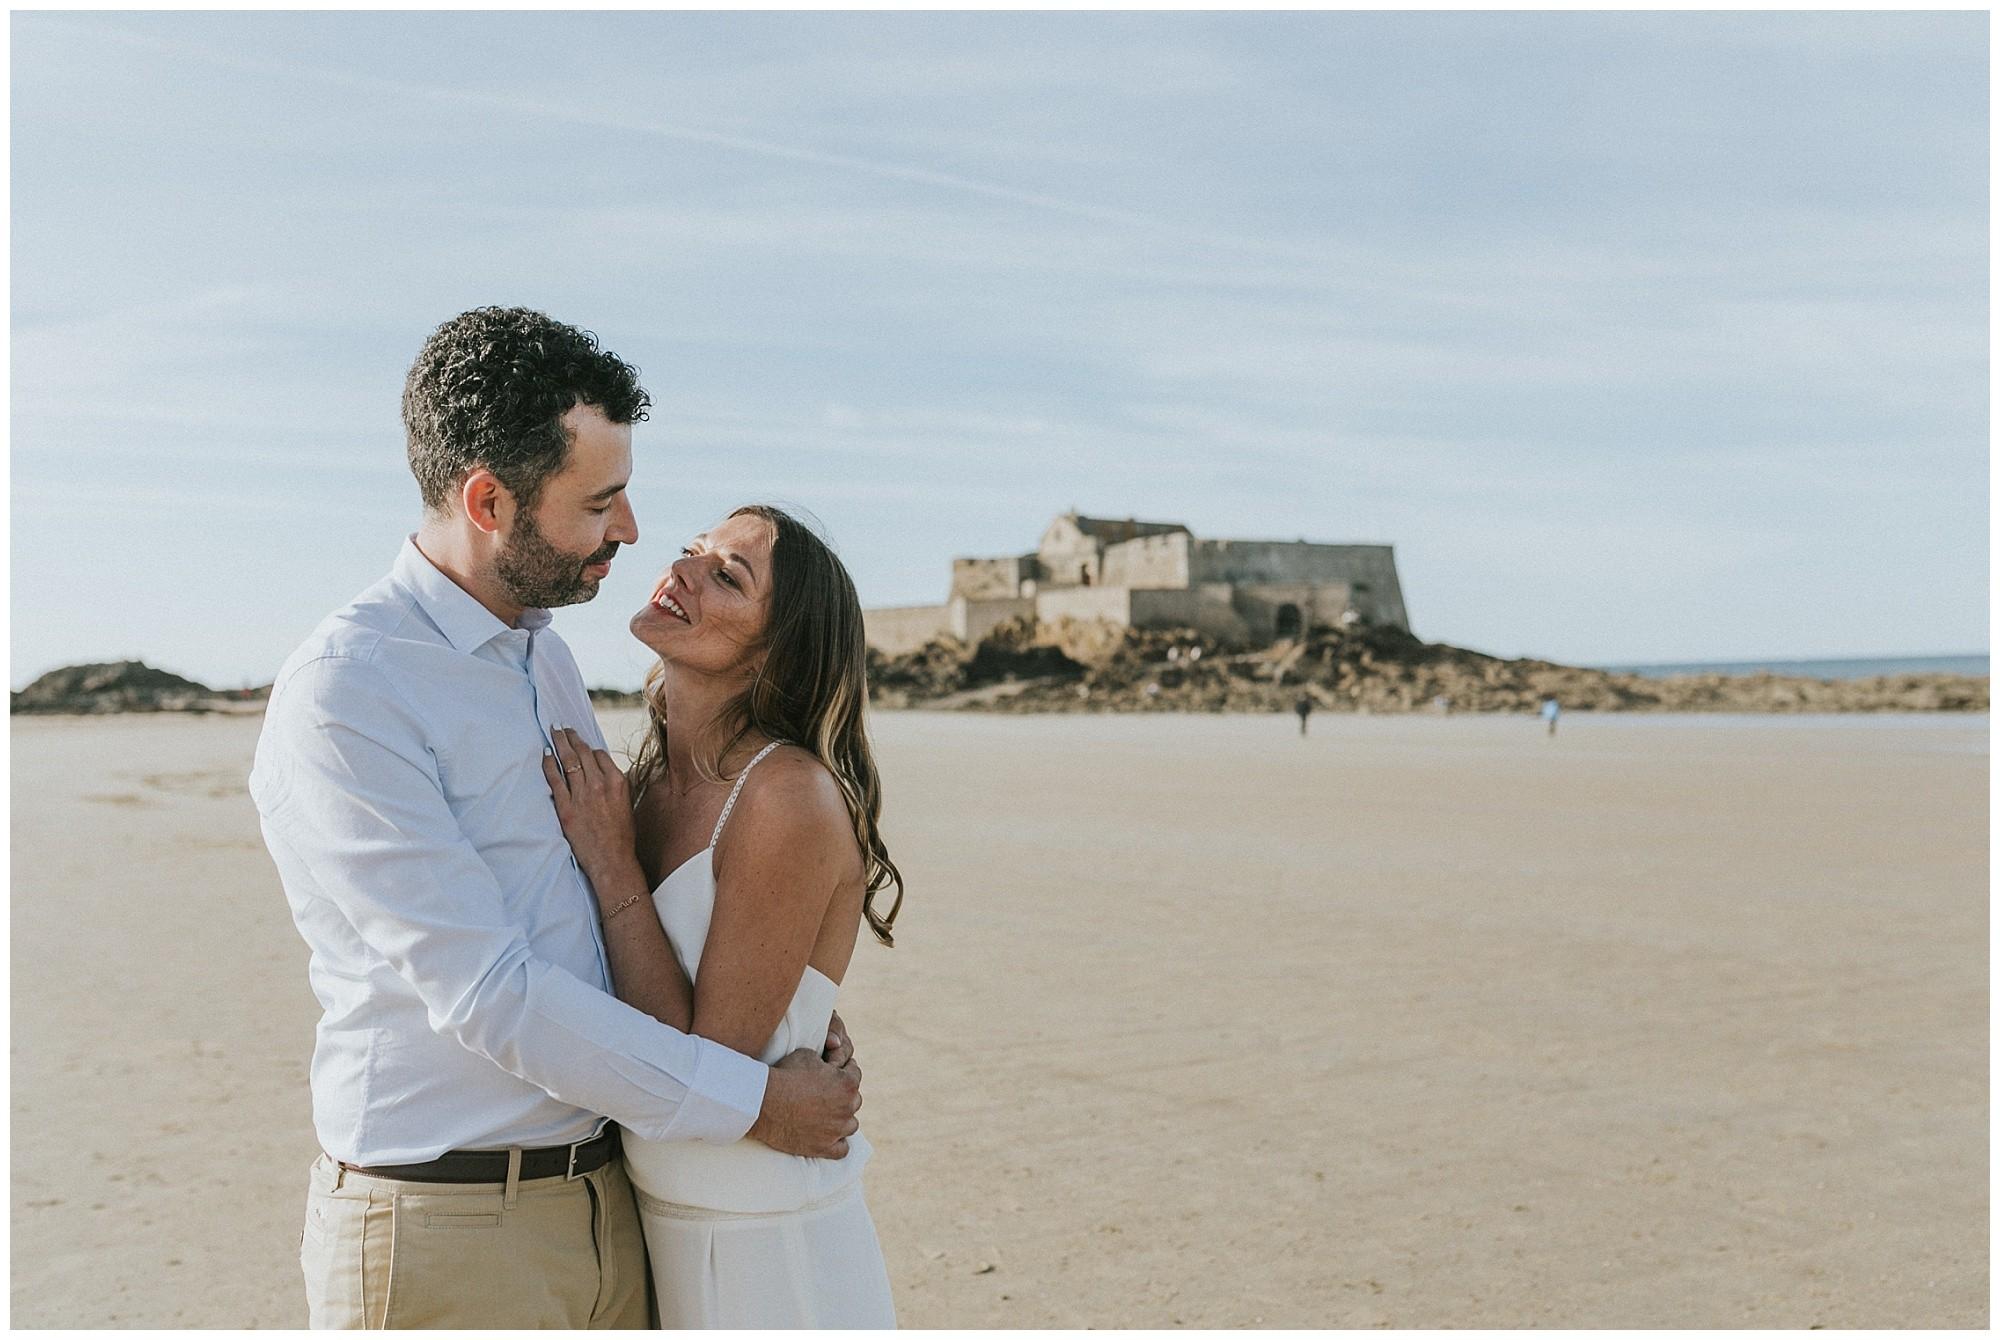 Kateryna-photos-photographe-mariage-bretagne-saint-malo-finistere-cotes-darmor-wedding_0065.jpg